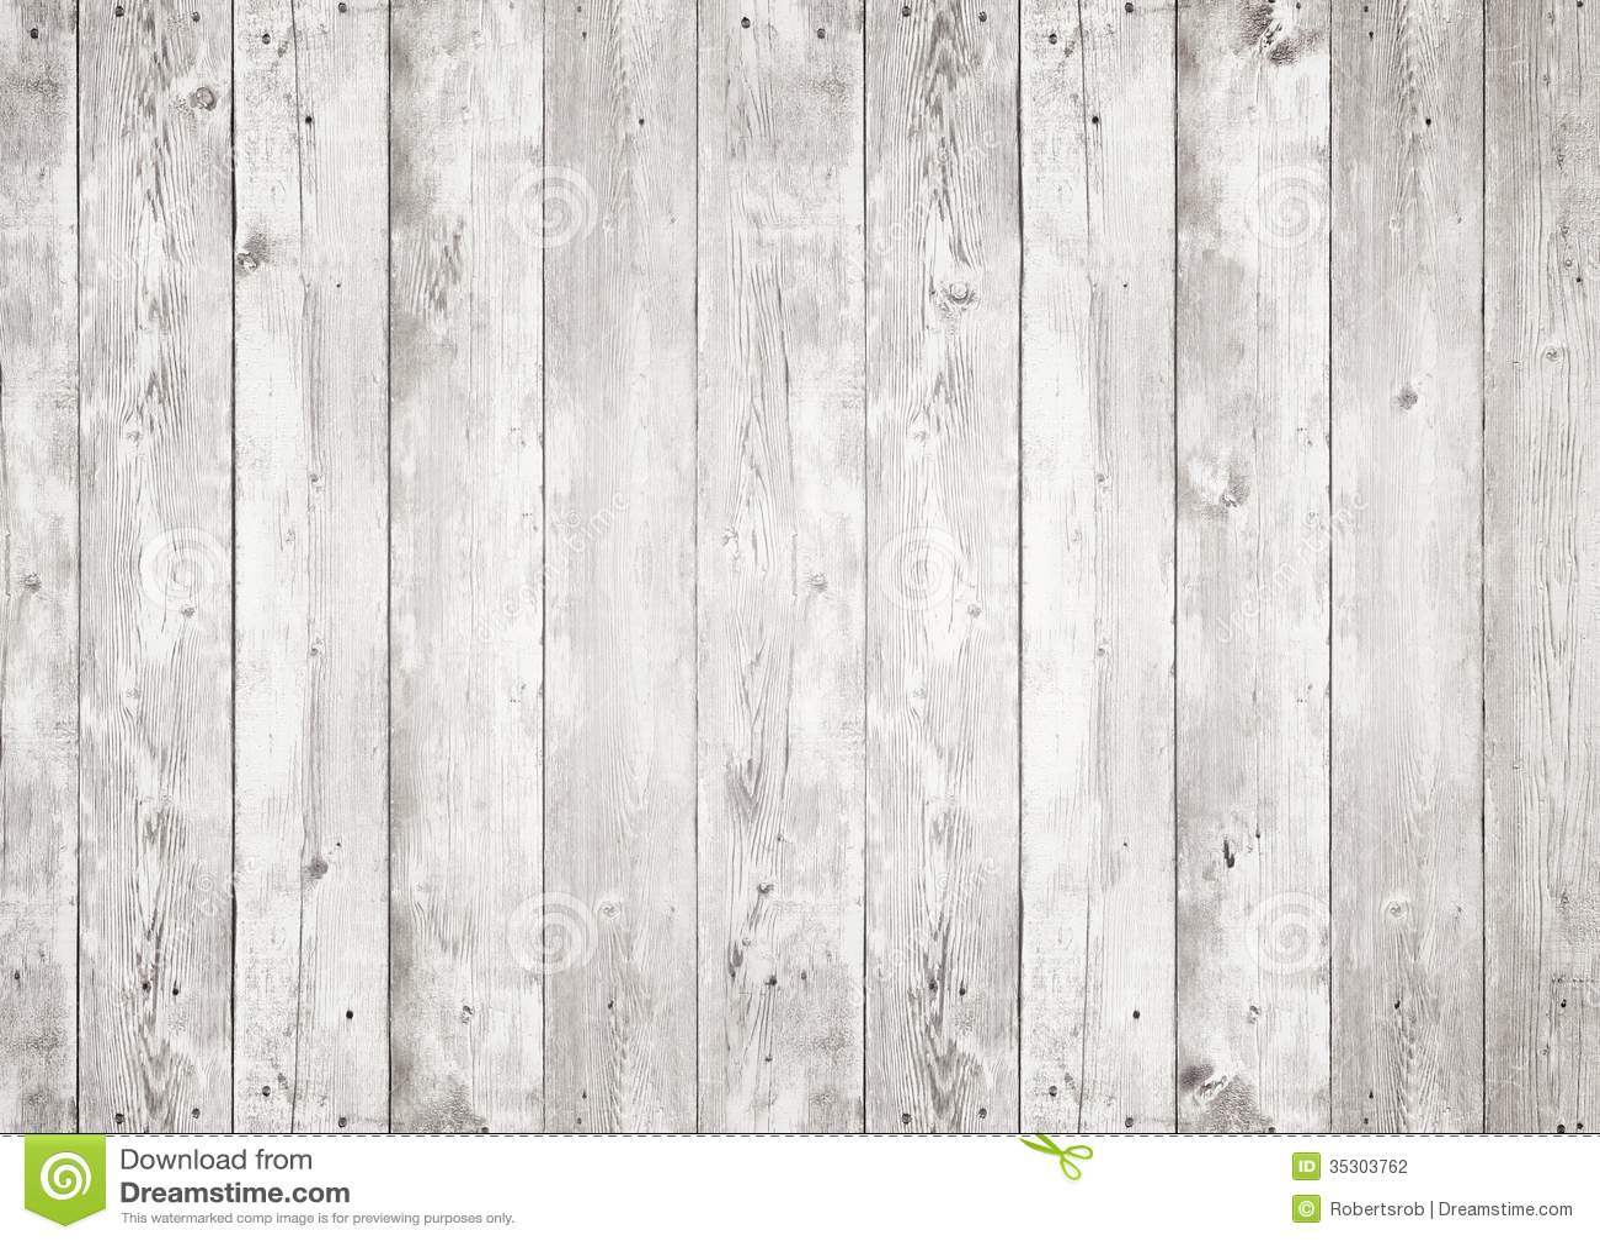 Wood stock photo. Image of decor, macro, plank, brown ...